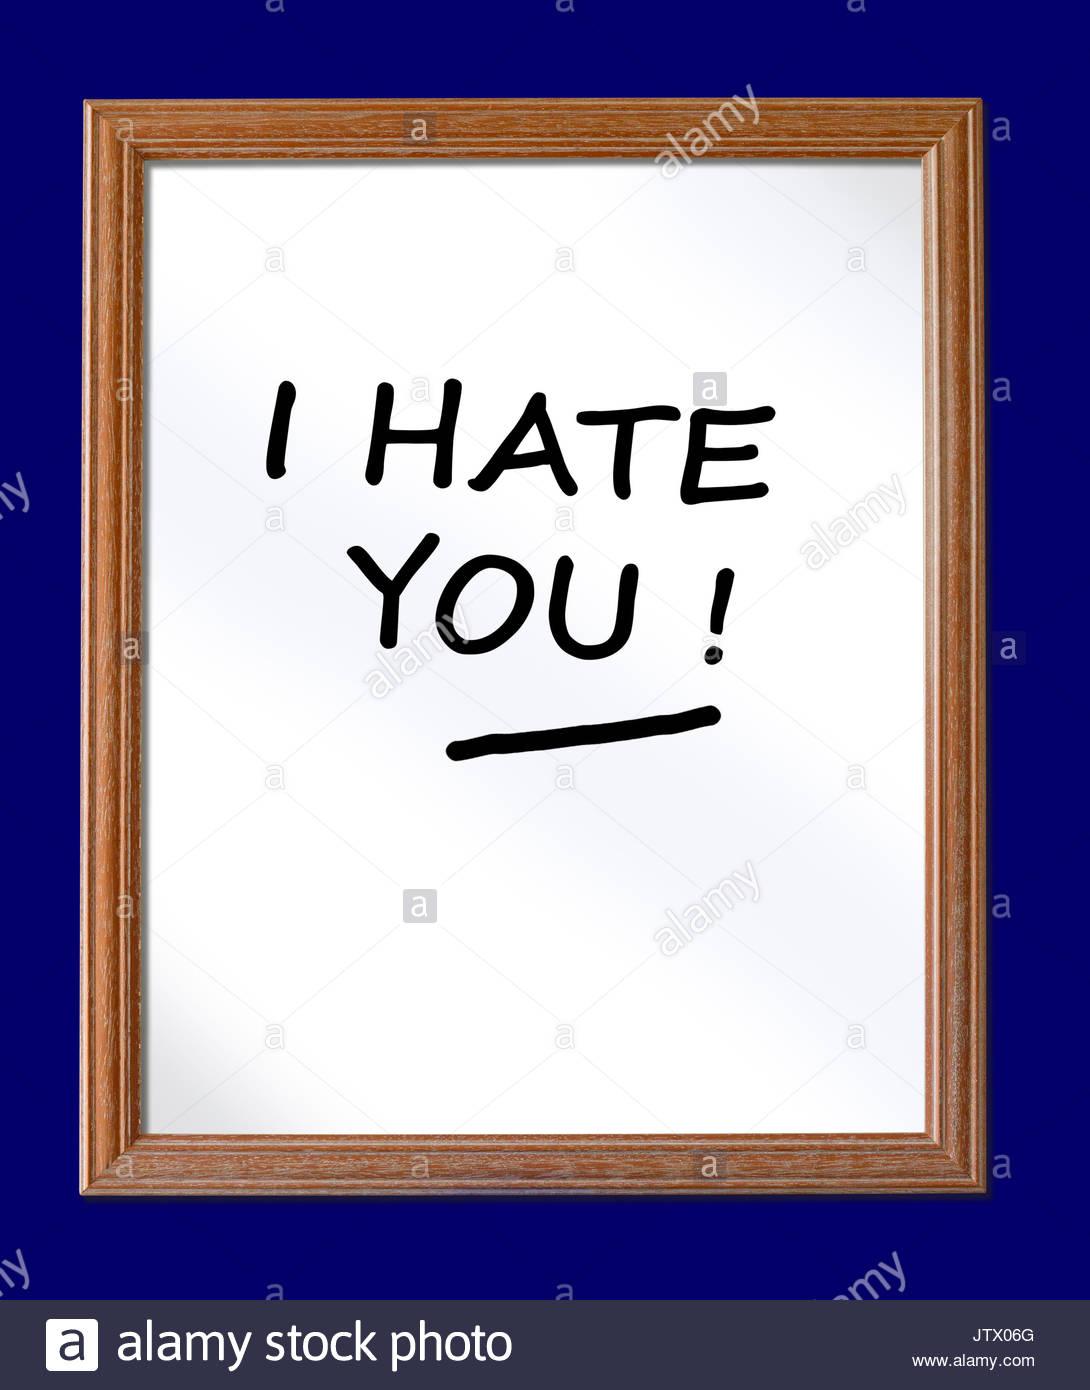 I Hate You written on a whiteboard, Blandford, Dorset, England, UK - Stock Image